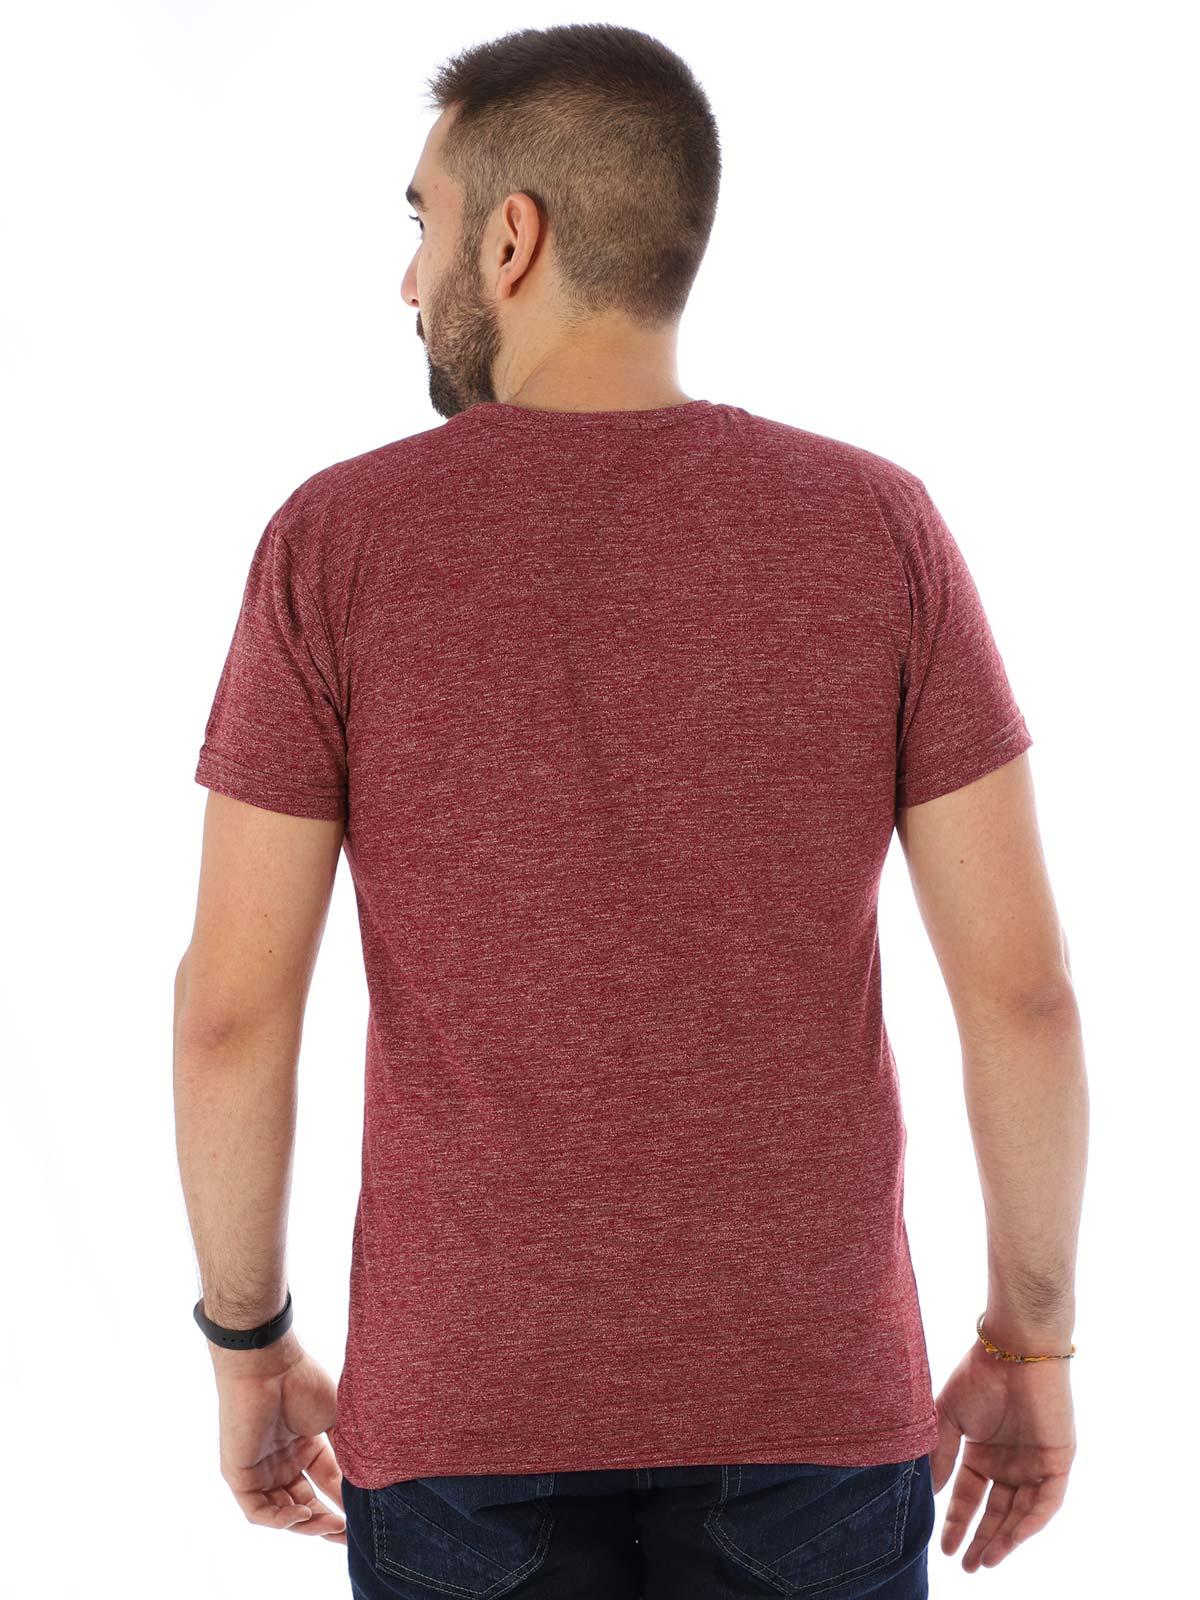 Camiseta Masculina Slim Fit Manga Curta Duo Bordo